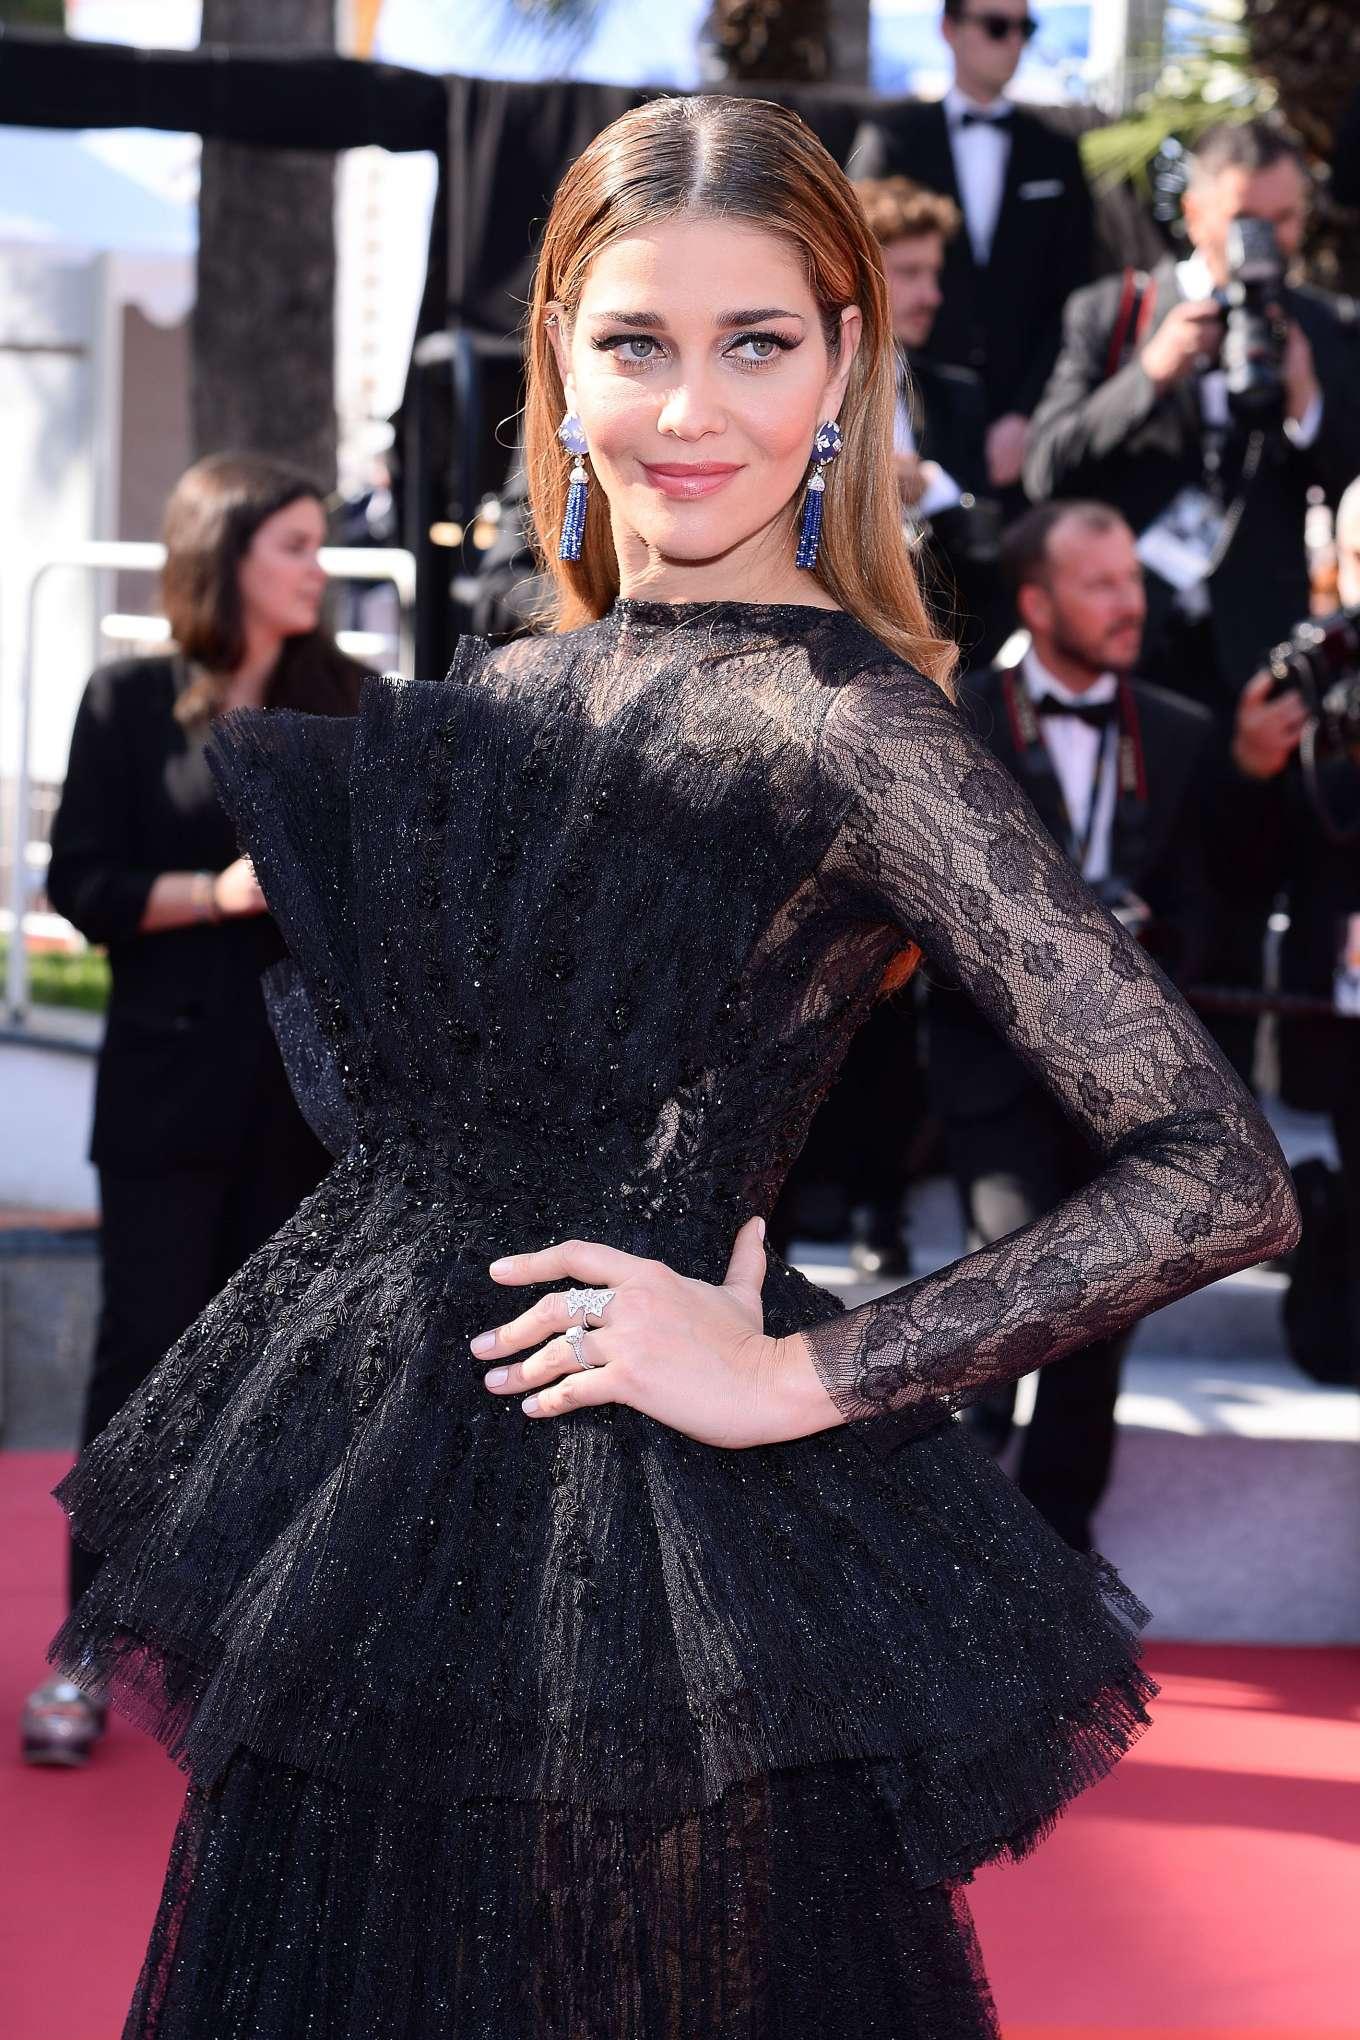 Ana Beatriz Barros - 'The Traitor' Premiere at 2019 Cannes Film Festival